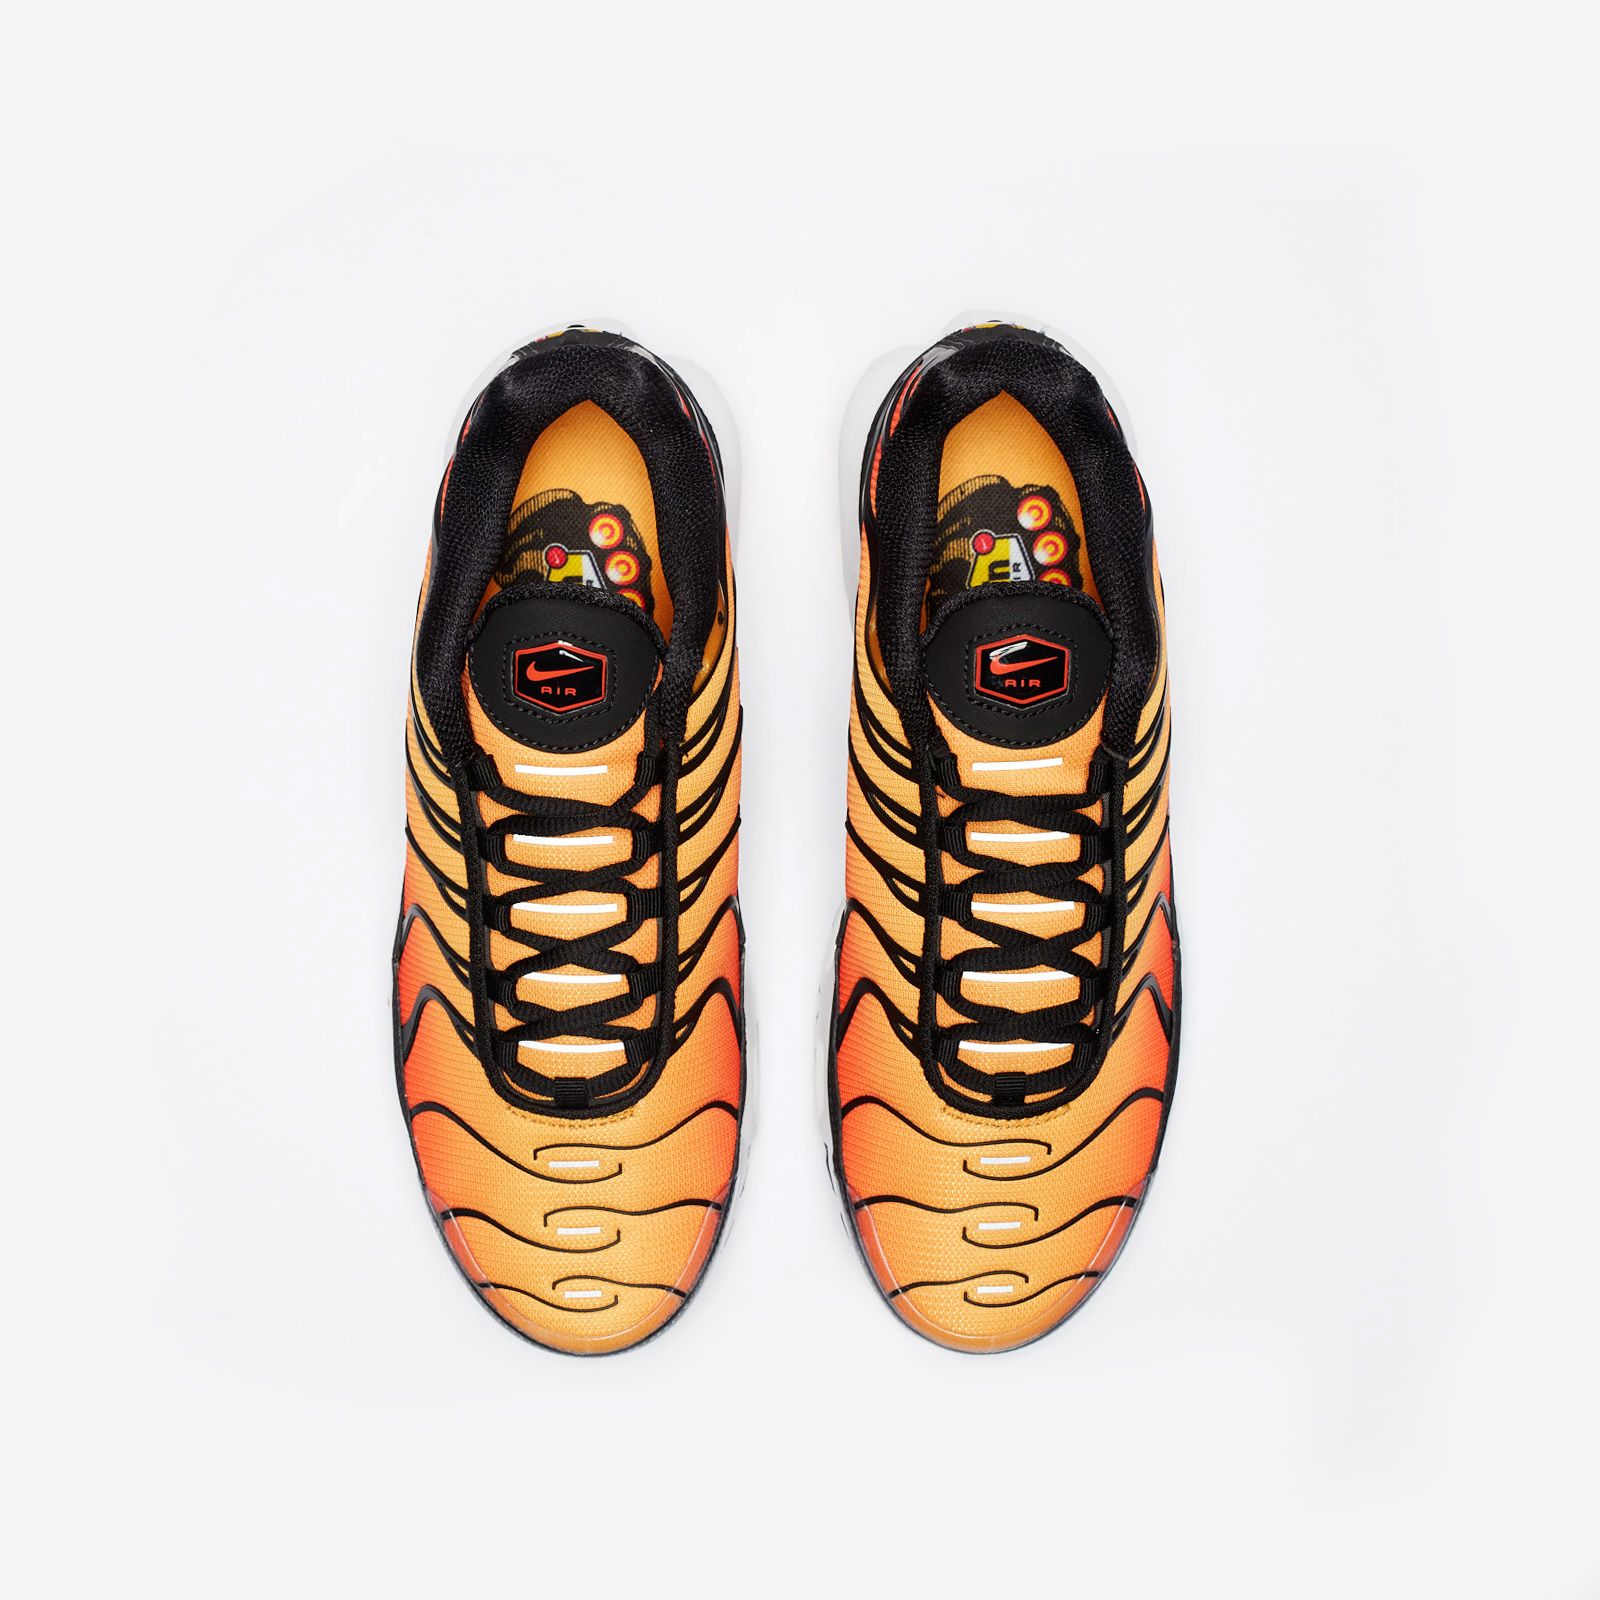 uk availability b125b 95a09 Nike Sportswear Air Max Plus OG - 7. Close